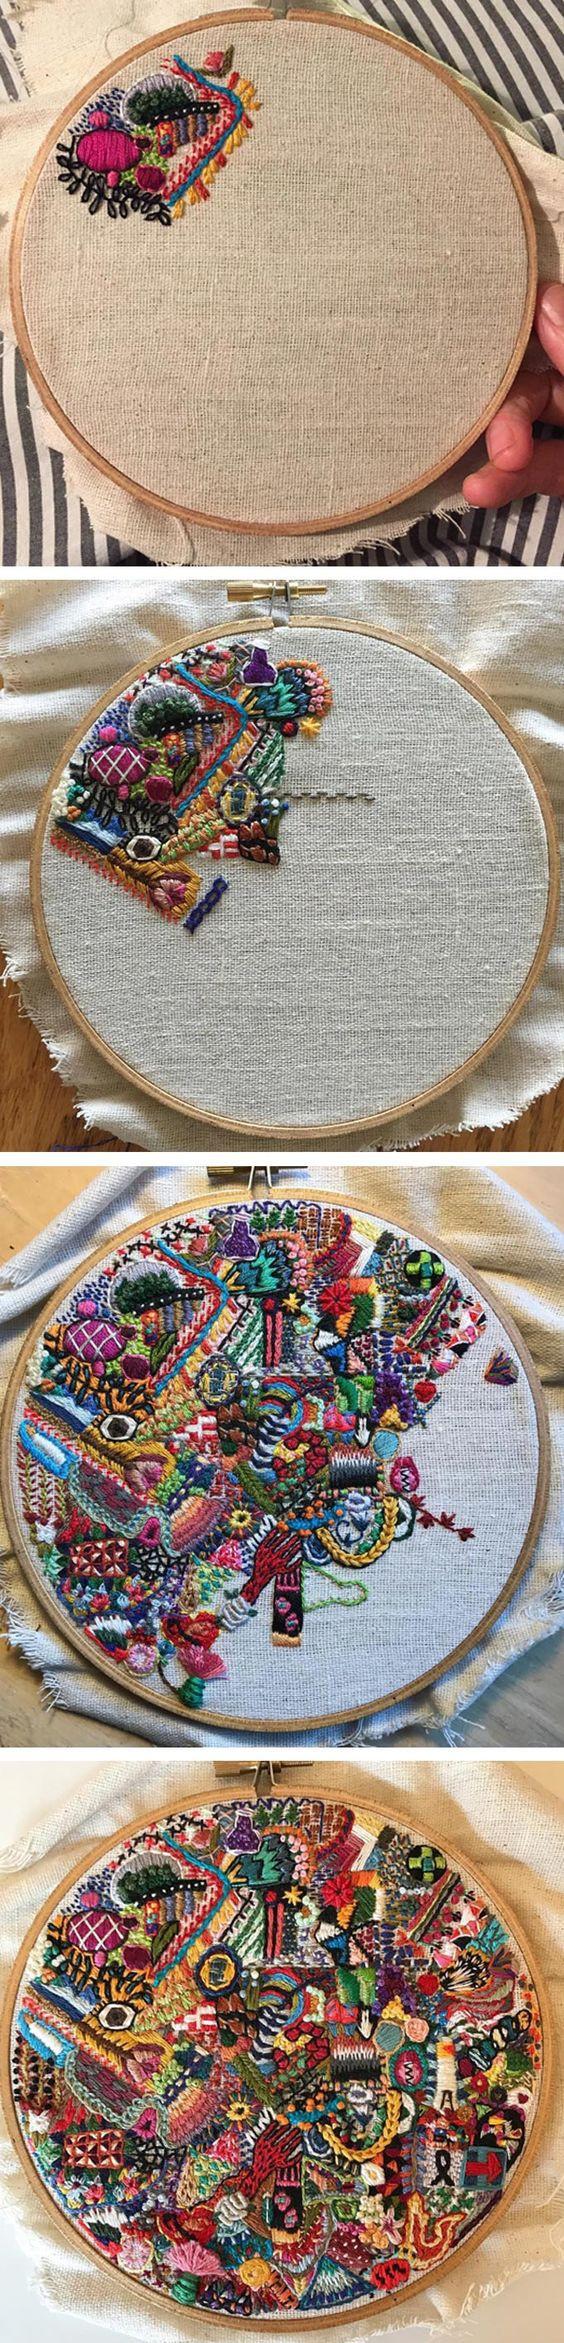 http://www.brwnpaperbag.com/1-year-of-stitches-michelle-anais-beaulieu-morgan/